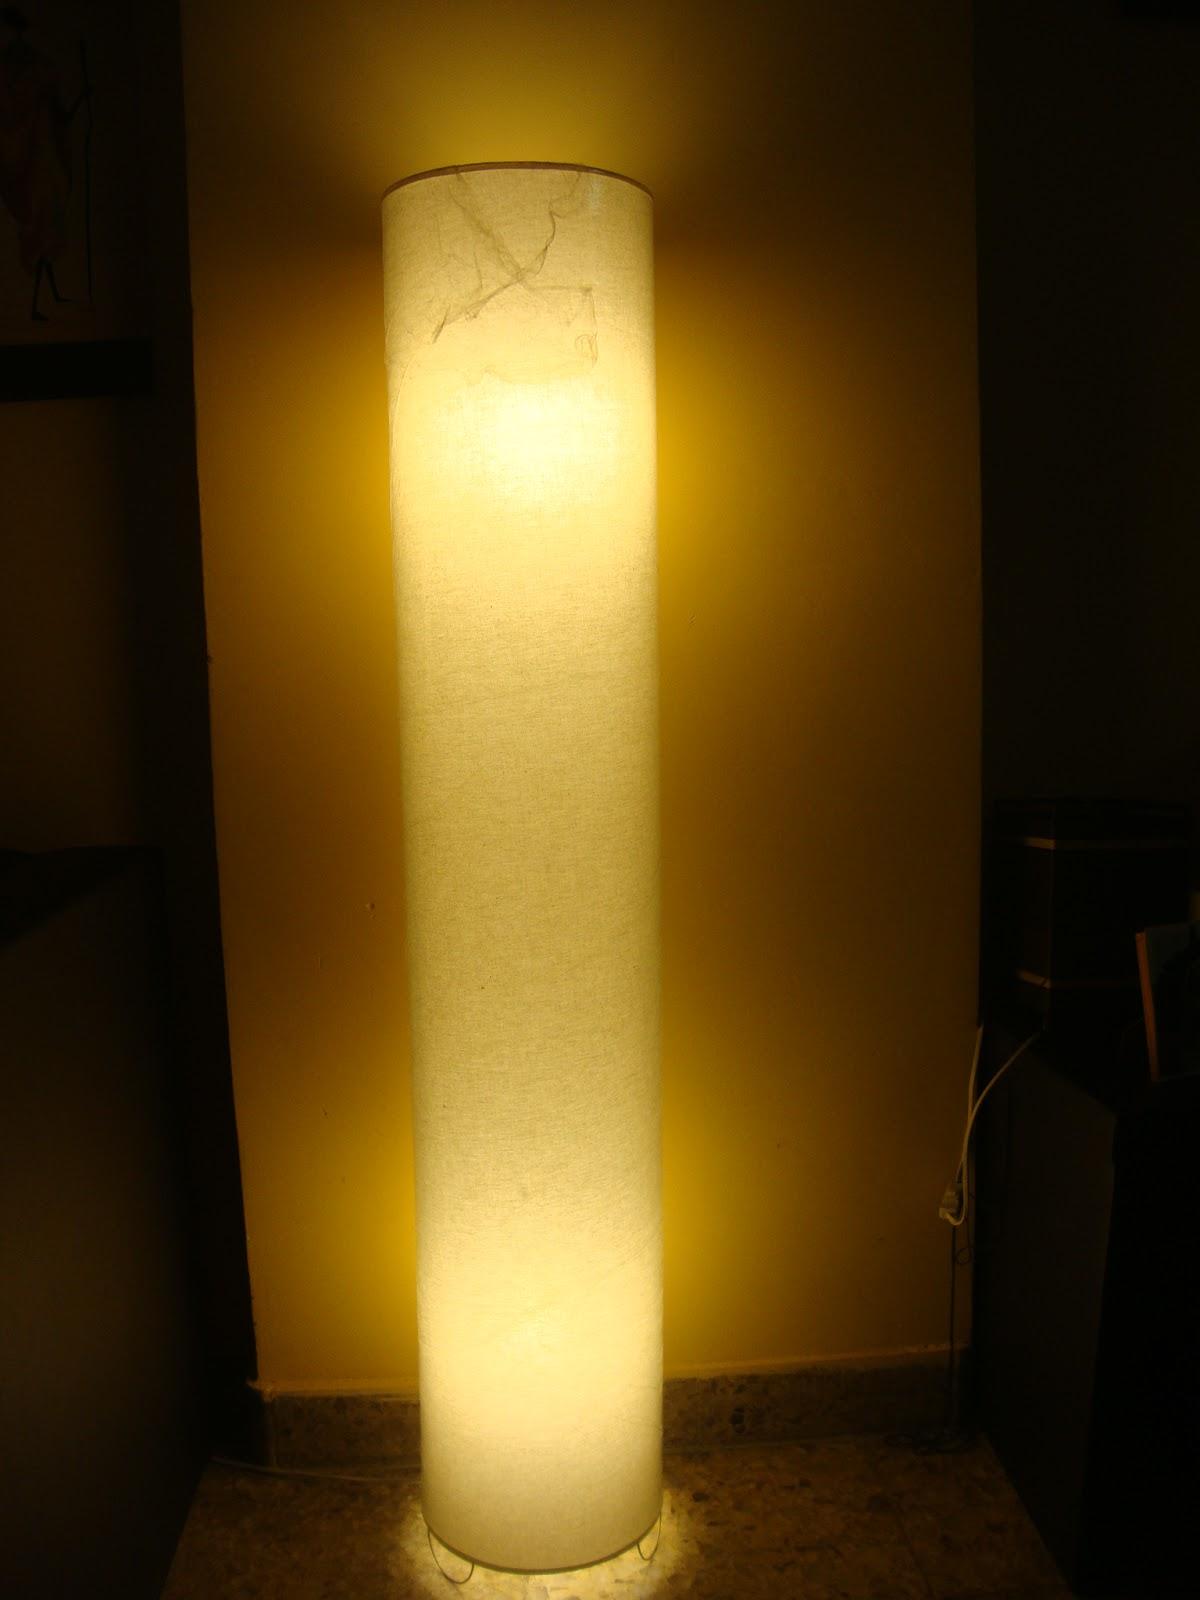 Calida iluminacion lamparas de pie tubo - Iluminacion lamparas de pie ...